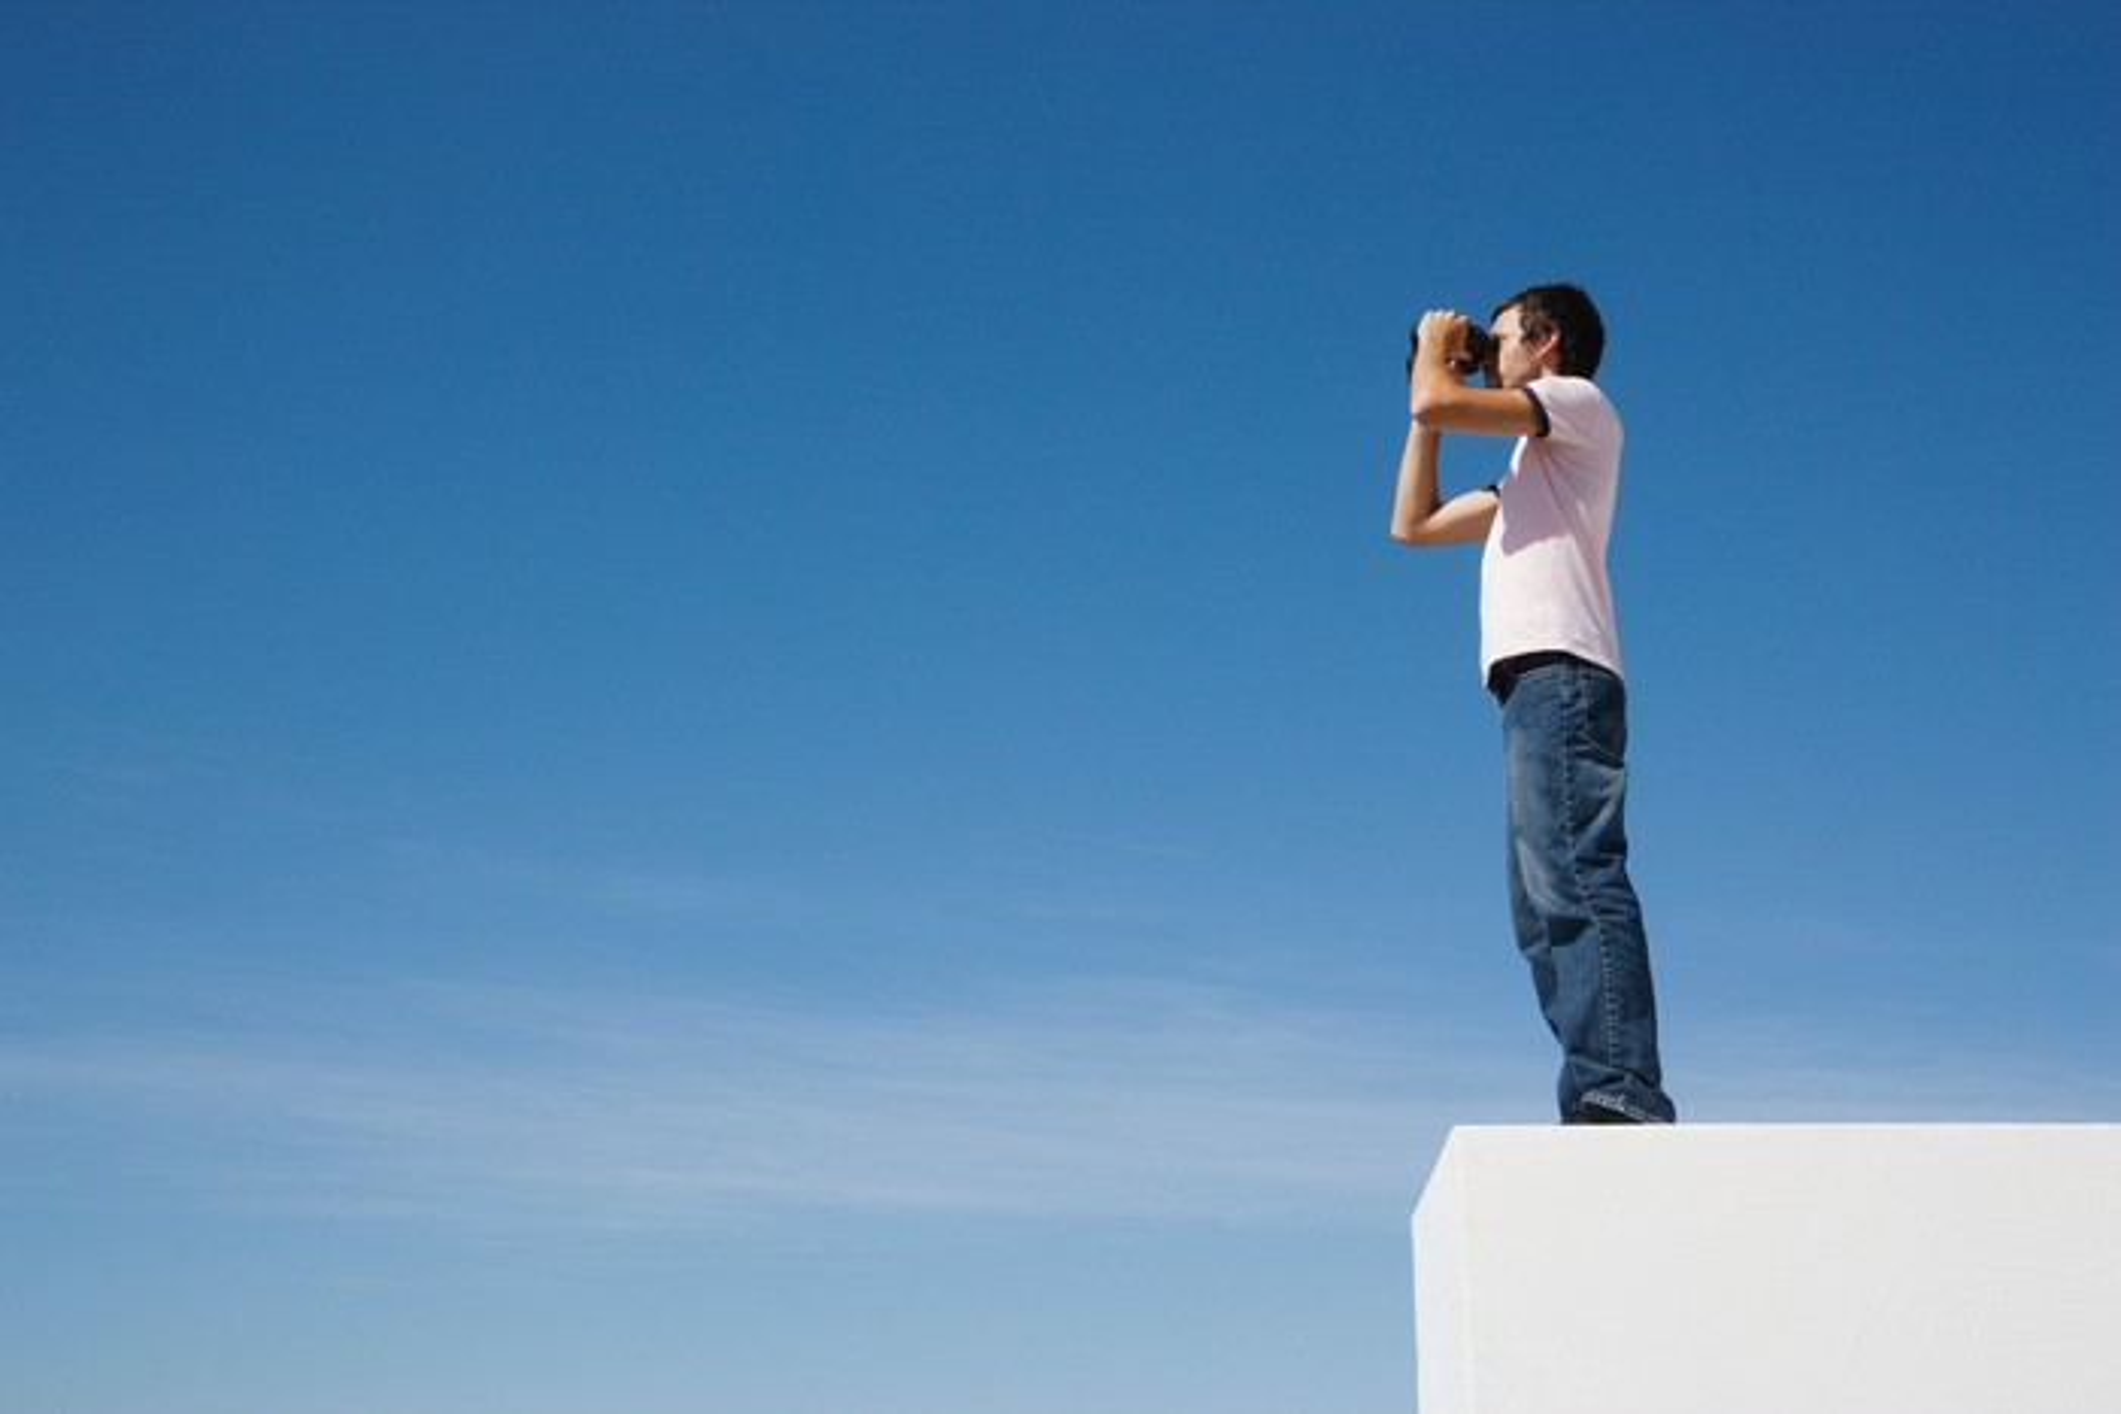 Man looking through a pair of binoculars.